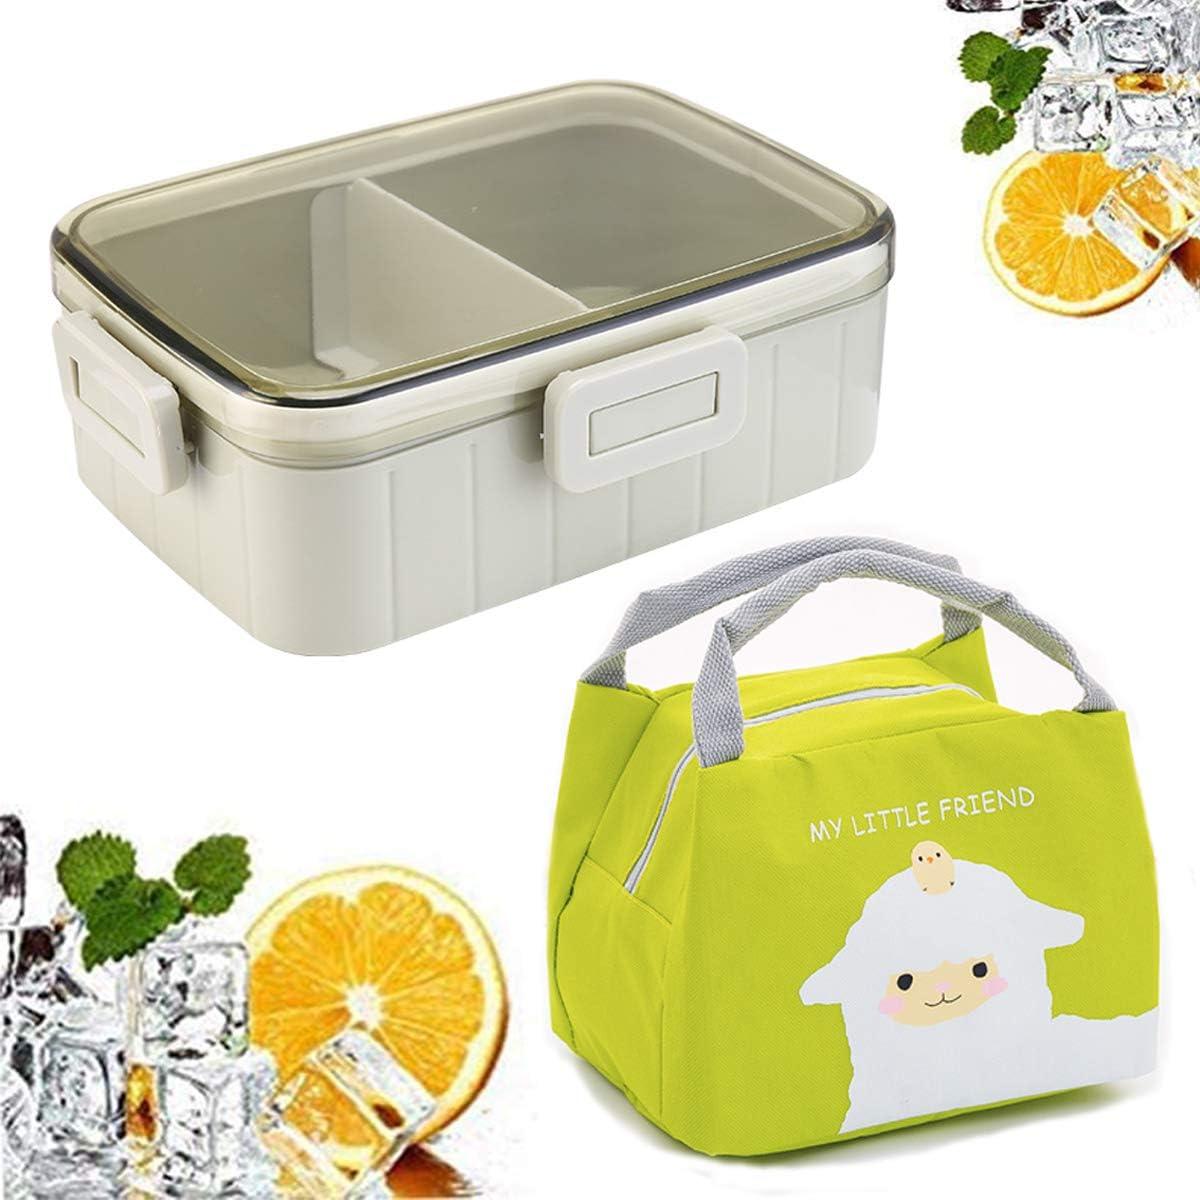 Lunch Box Infantil, Jicyor Caja de Bento Plastico Portátil Caja de Almuerzo 2 Compartimentos Fiambrera Contenedores de Alimentos con Térmica Bolsa para Meal Prep Comidas Conservación